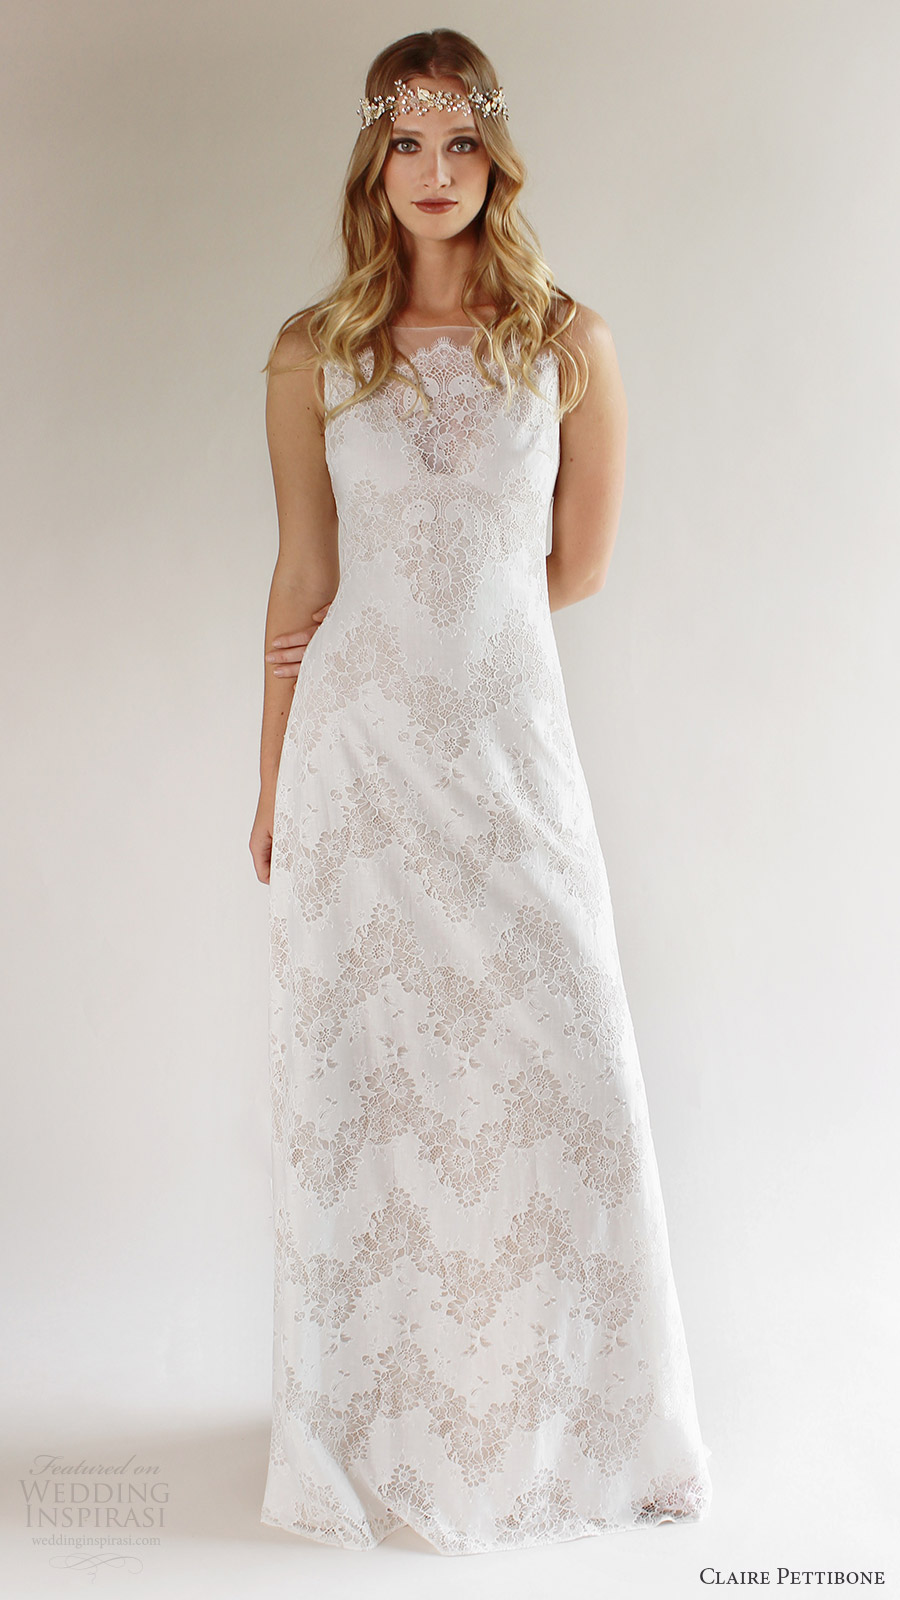 claire pettibone wedding dresses photo - 1